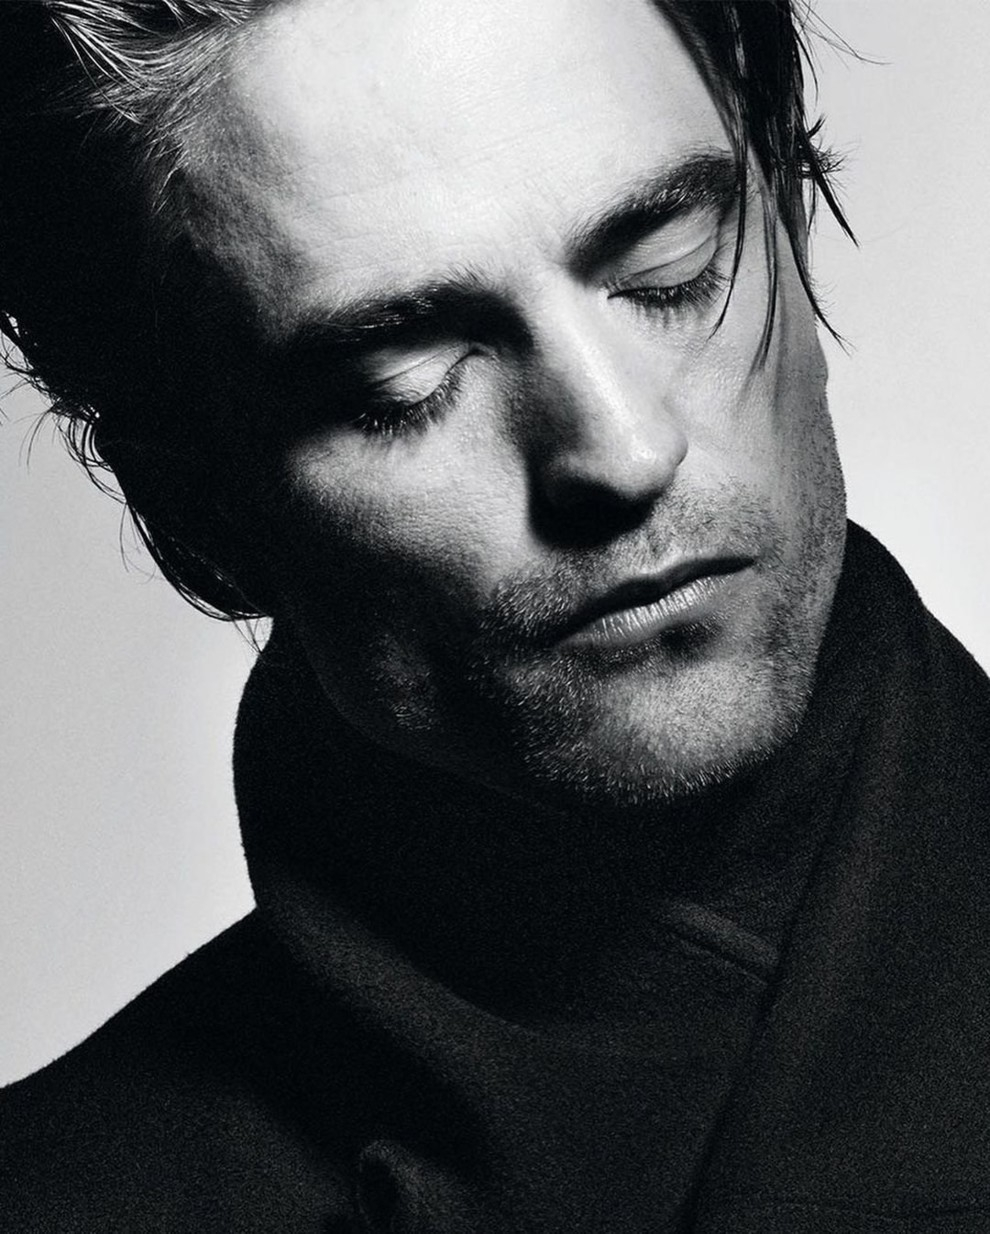 Любуемся: Роберт Паттинсон снялся в рекламной кампании Dior Homme (ФОТО) - фото №4